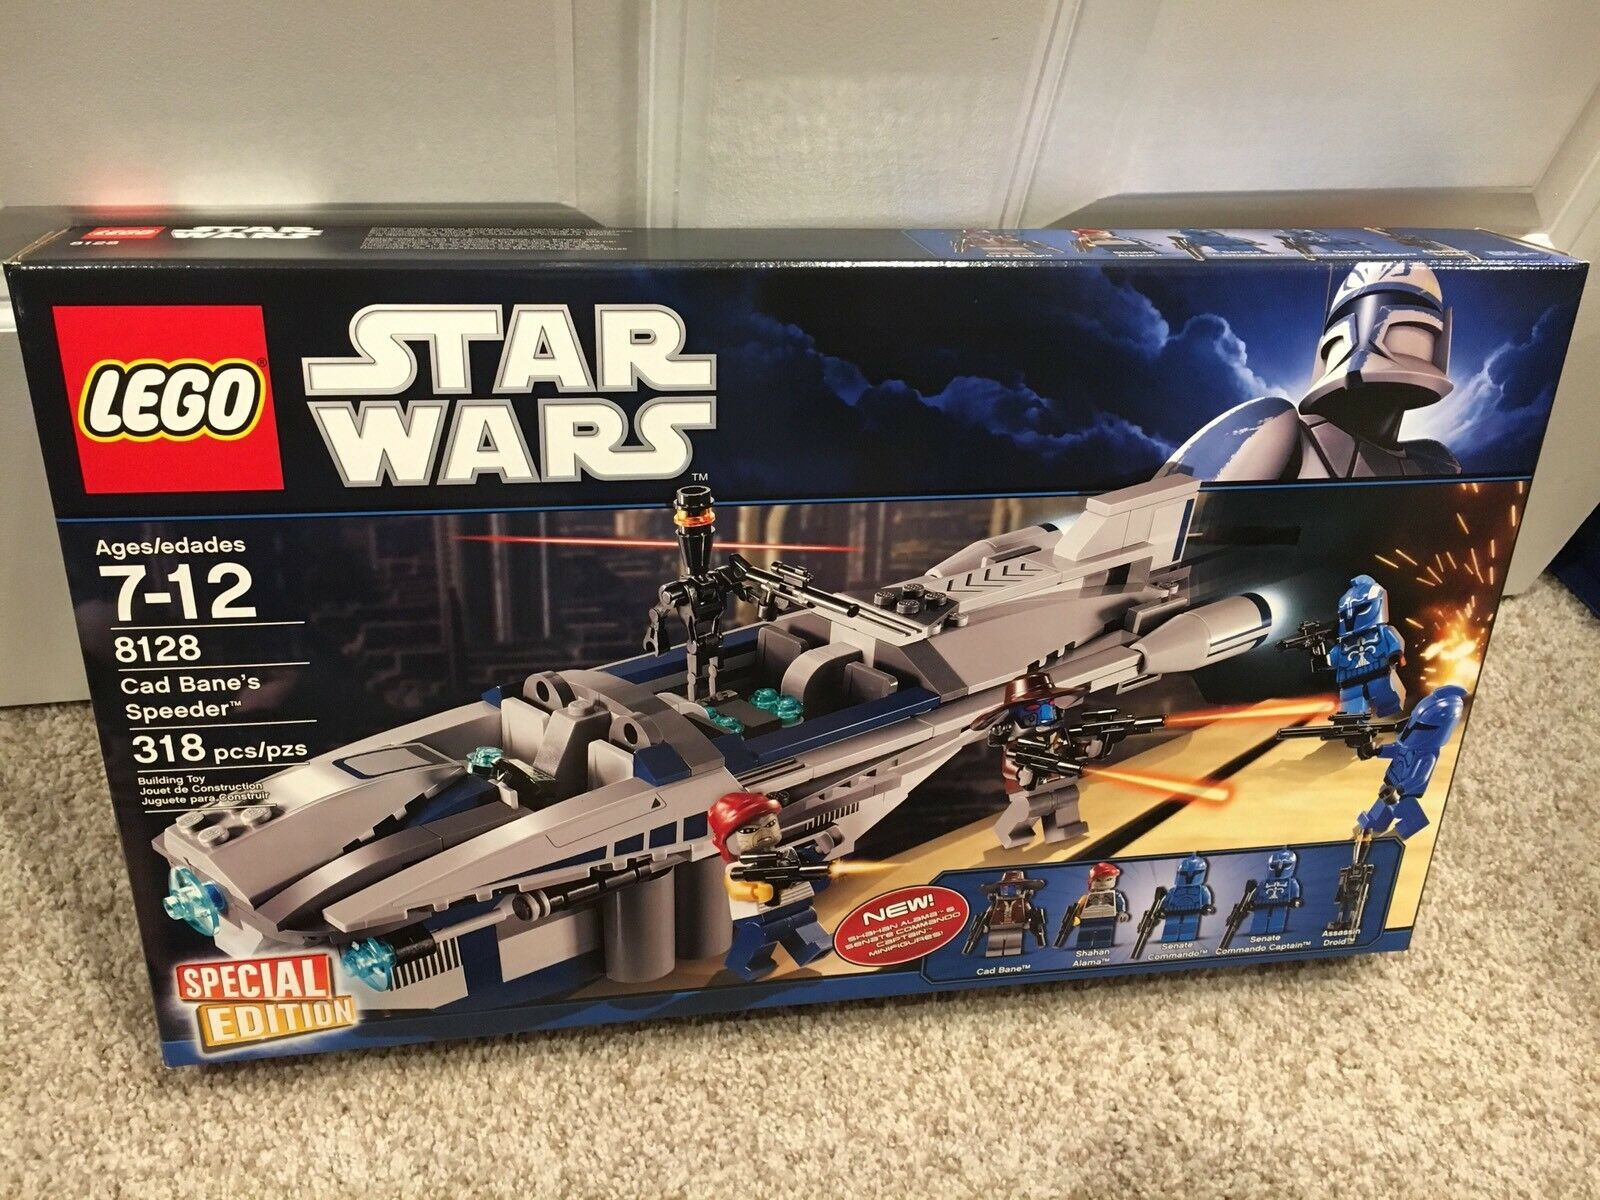 NIB Lego Star Wars 8128 CAD BANE'S SPEEDER Special Edition Banes Ship 5 Minifigs